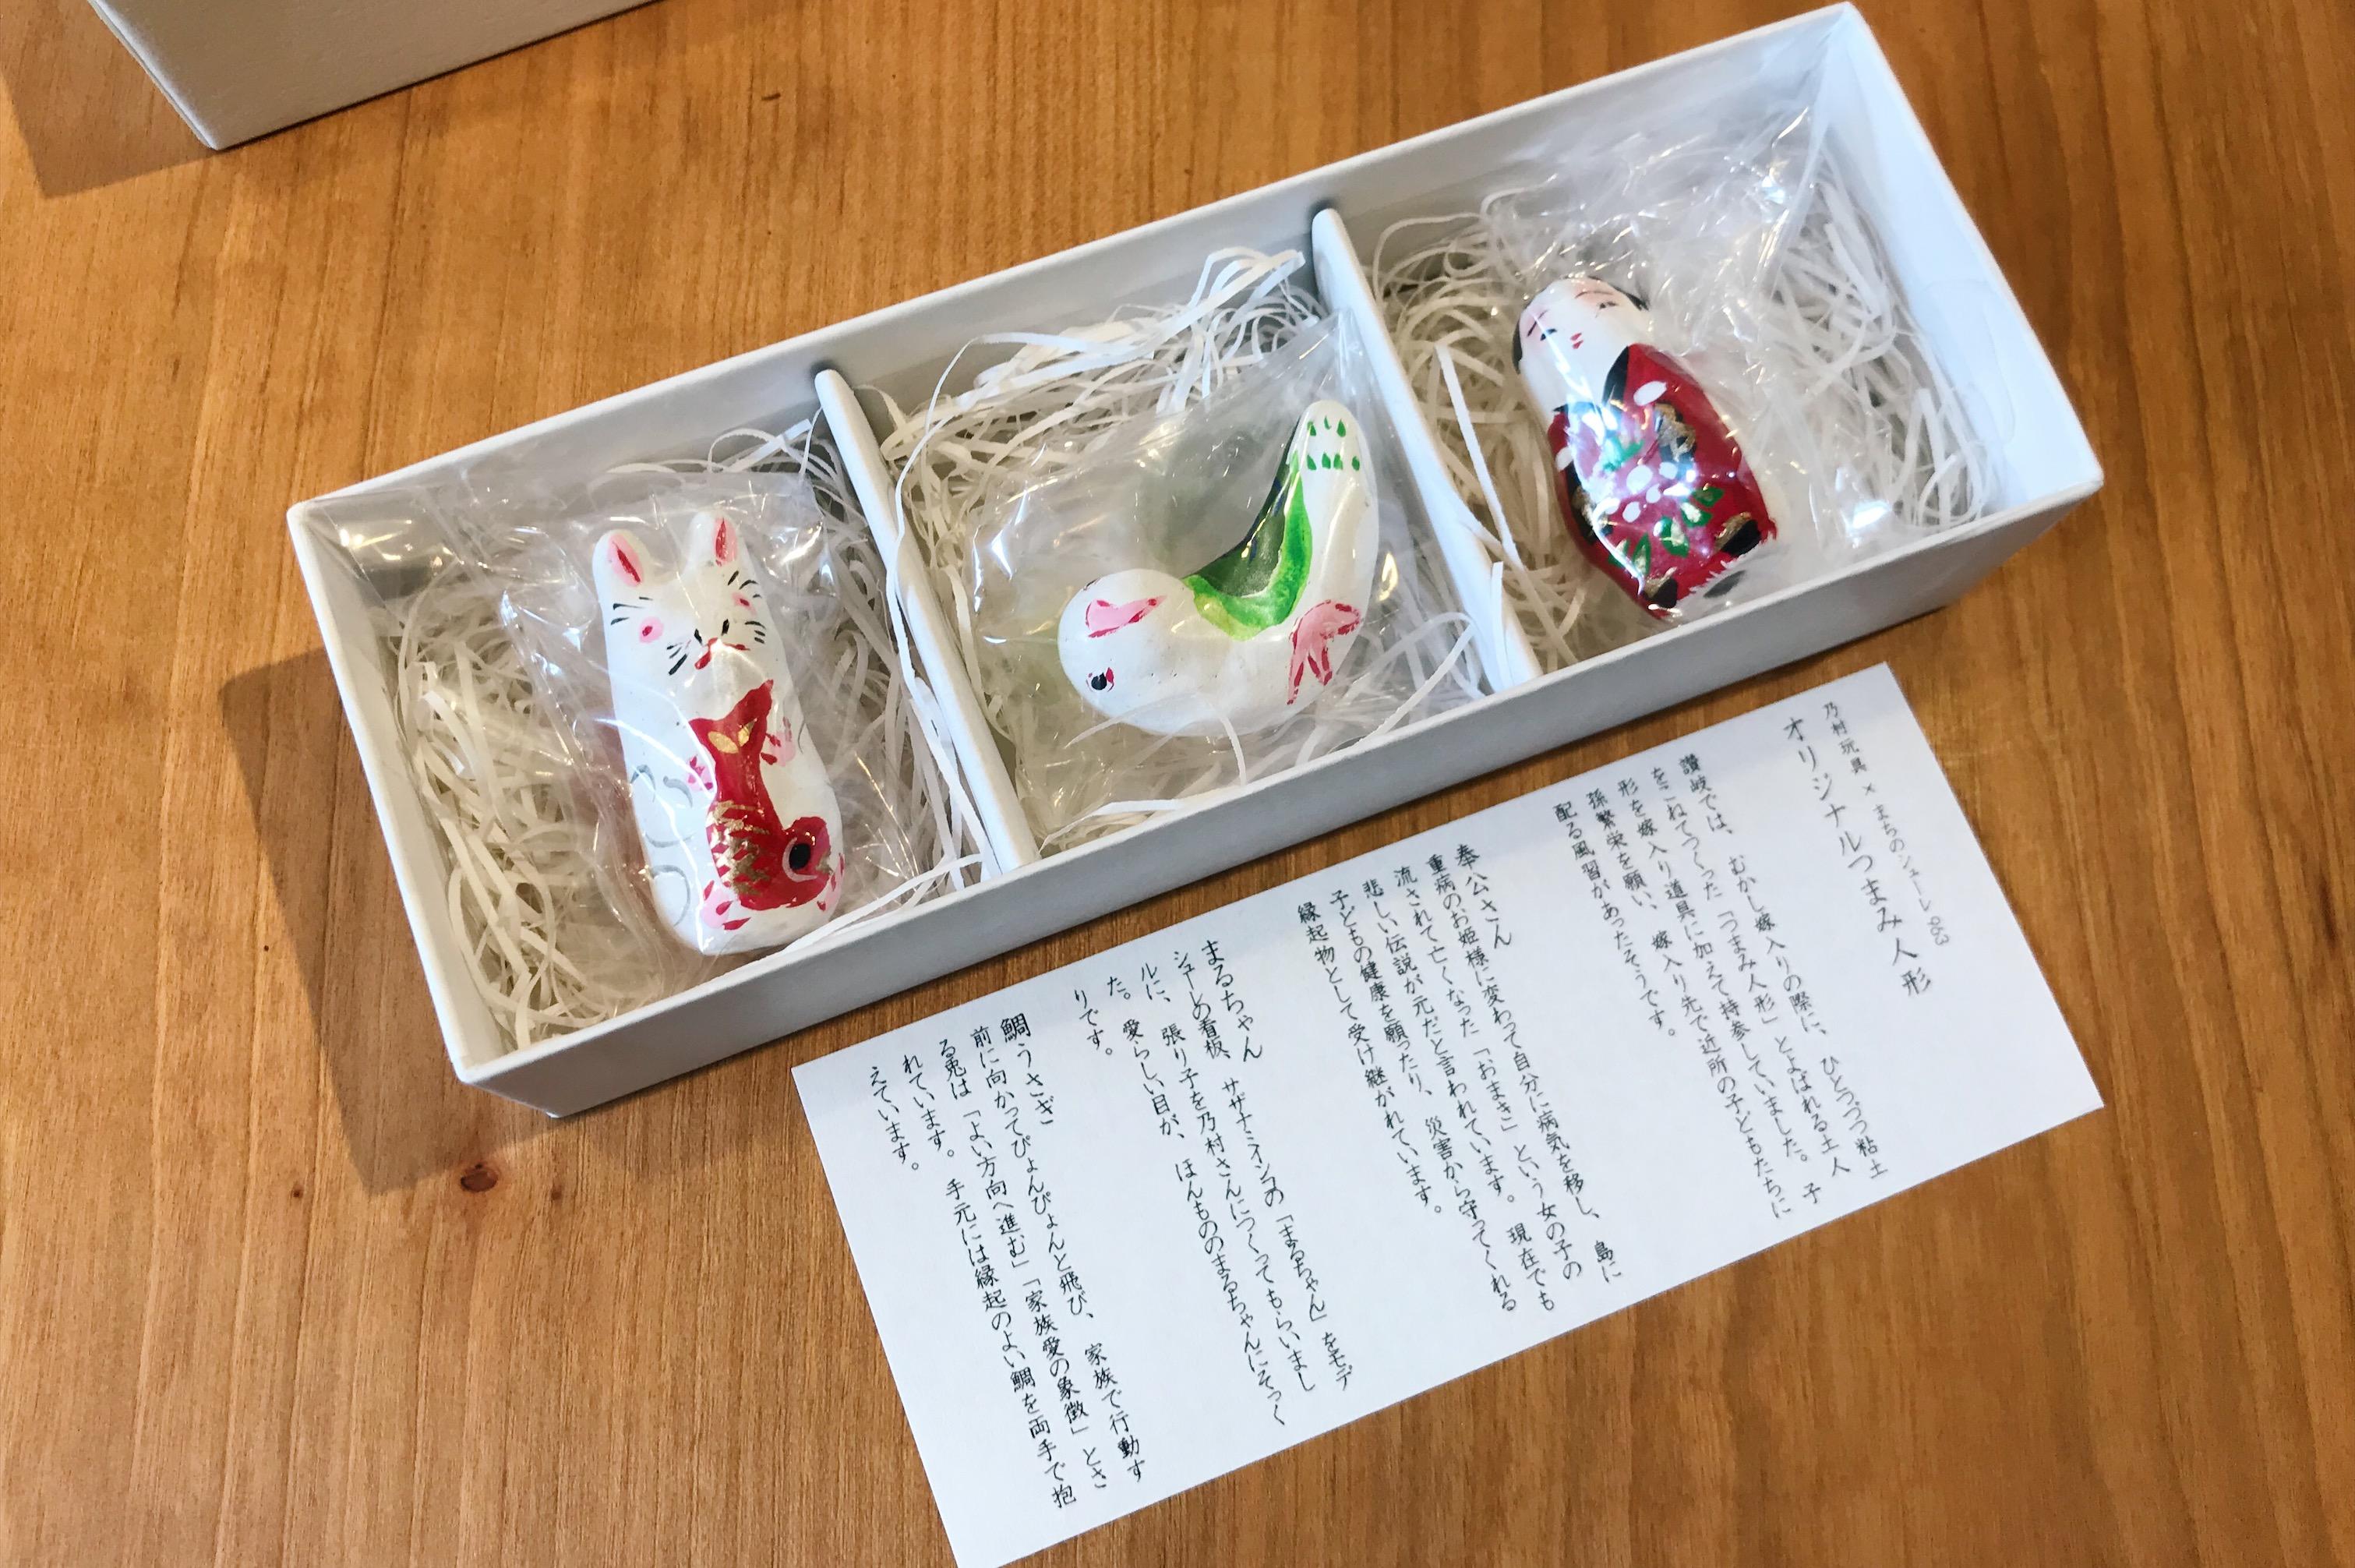 http://www.schule.jp/news/6D80D34C-6E18-46F5-833E-DE54D2F7C841.JPG